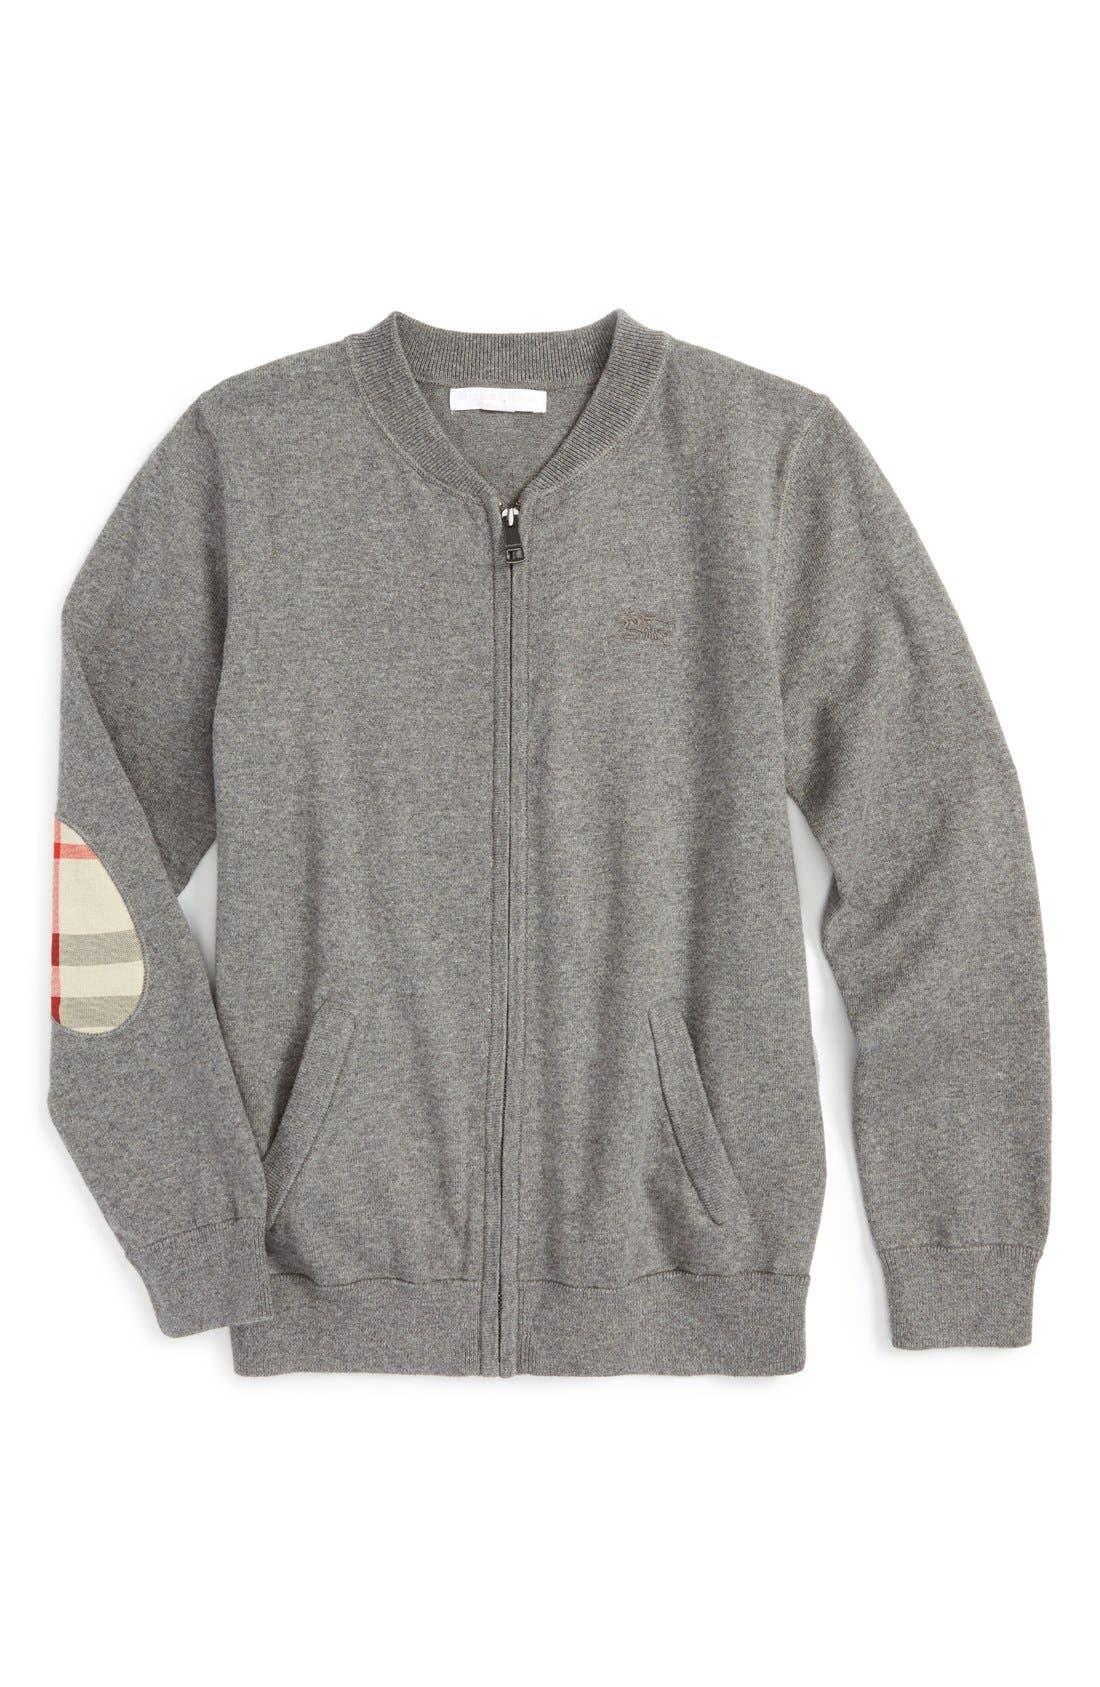 'Jaxon' Zip Front Cotton Cardigan,                             Main thumbnail 1, color,                             Mid Grey Melange